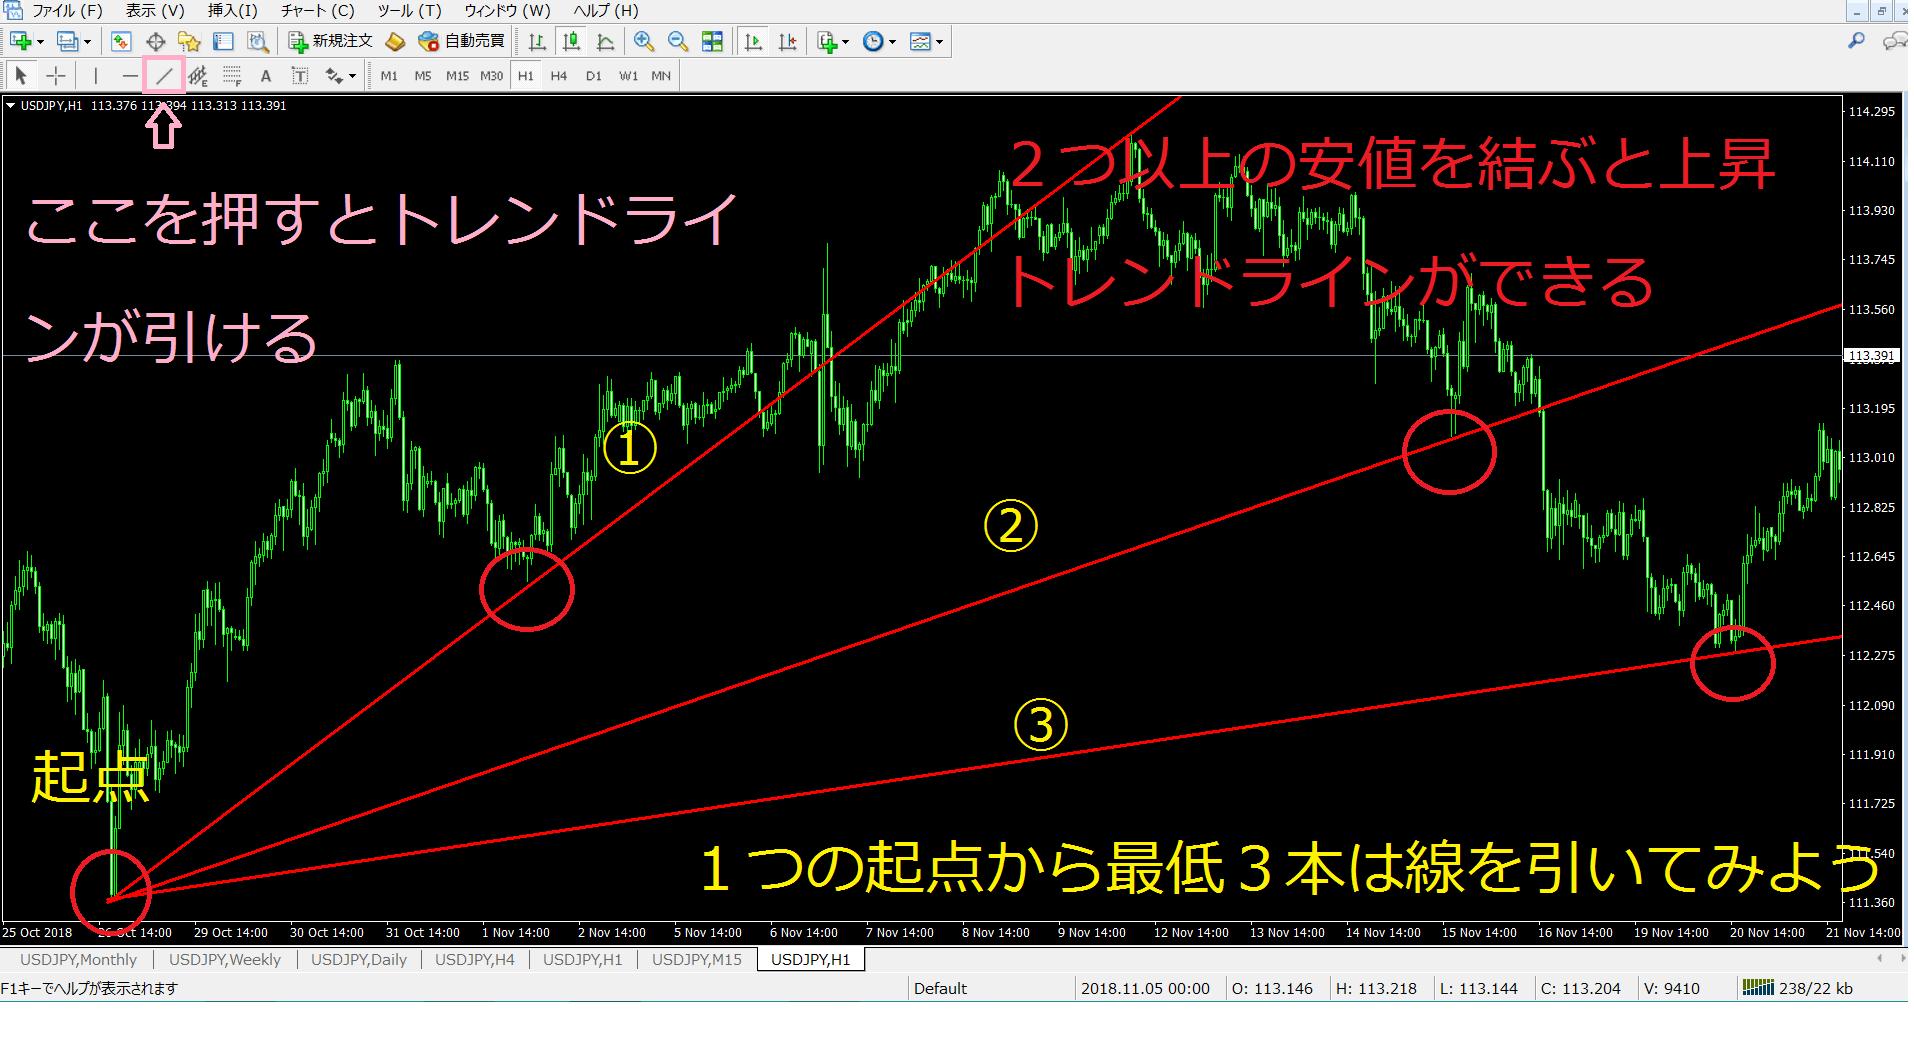 trendline-basis